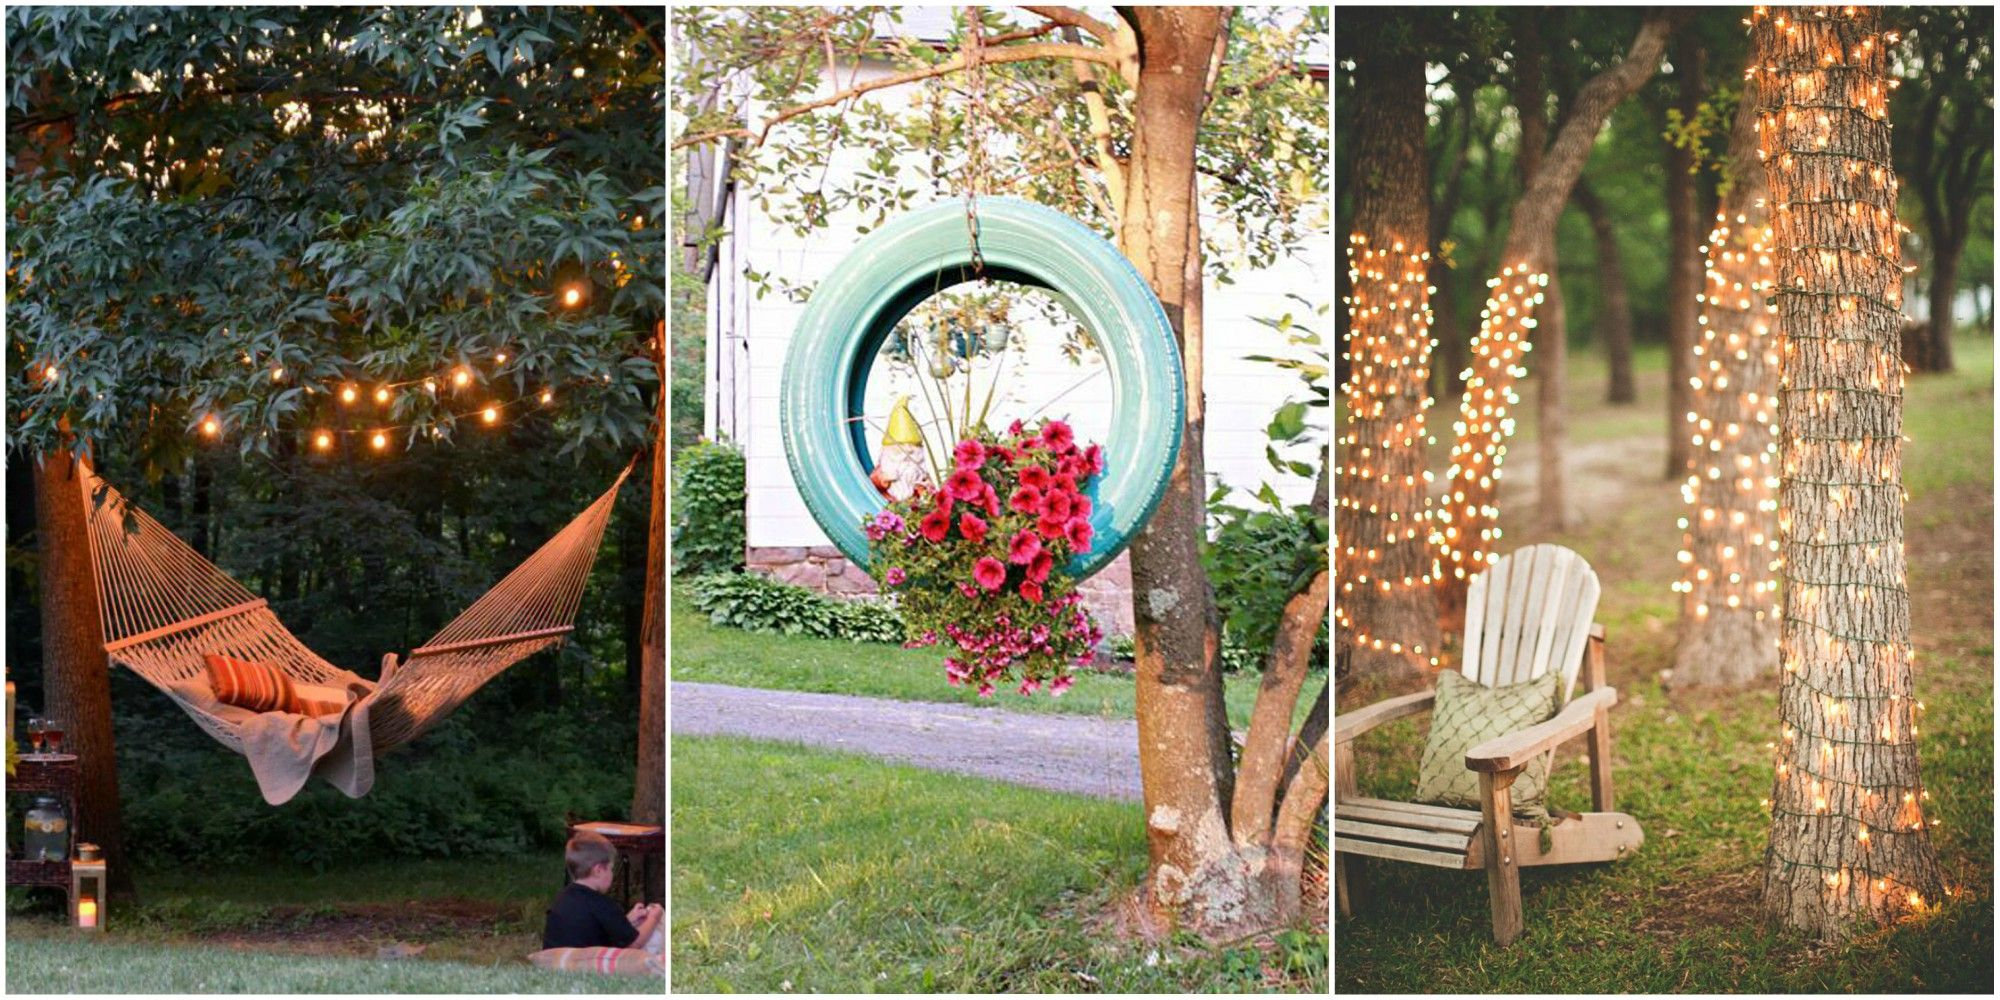 82 DIY Backyard Design Ideas , DIY Backyard Decor Tips